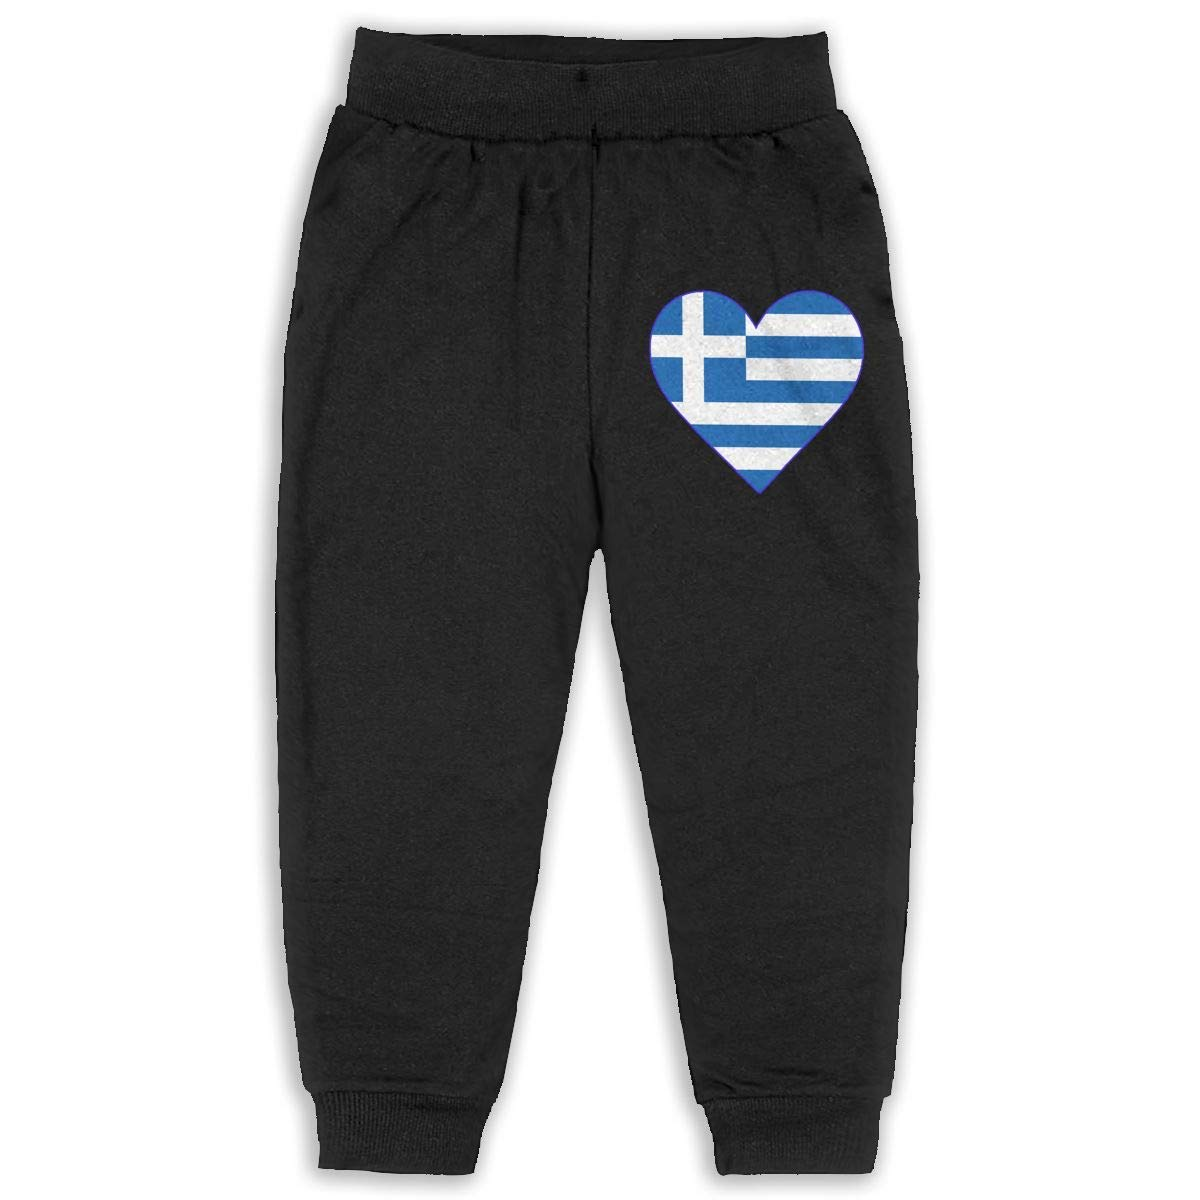 lu fangfangc Flag of Greece Childrens 2-6 Years Old Boys Girls Unisex Sport Sweatpants